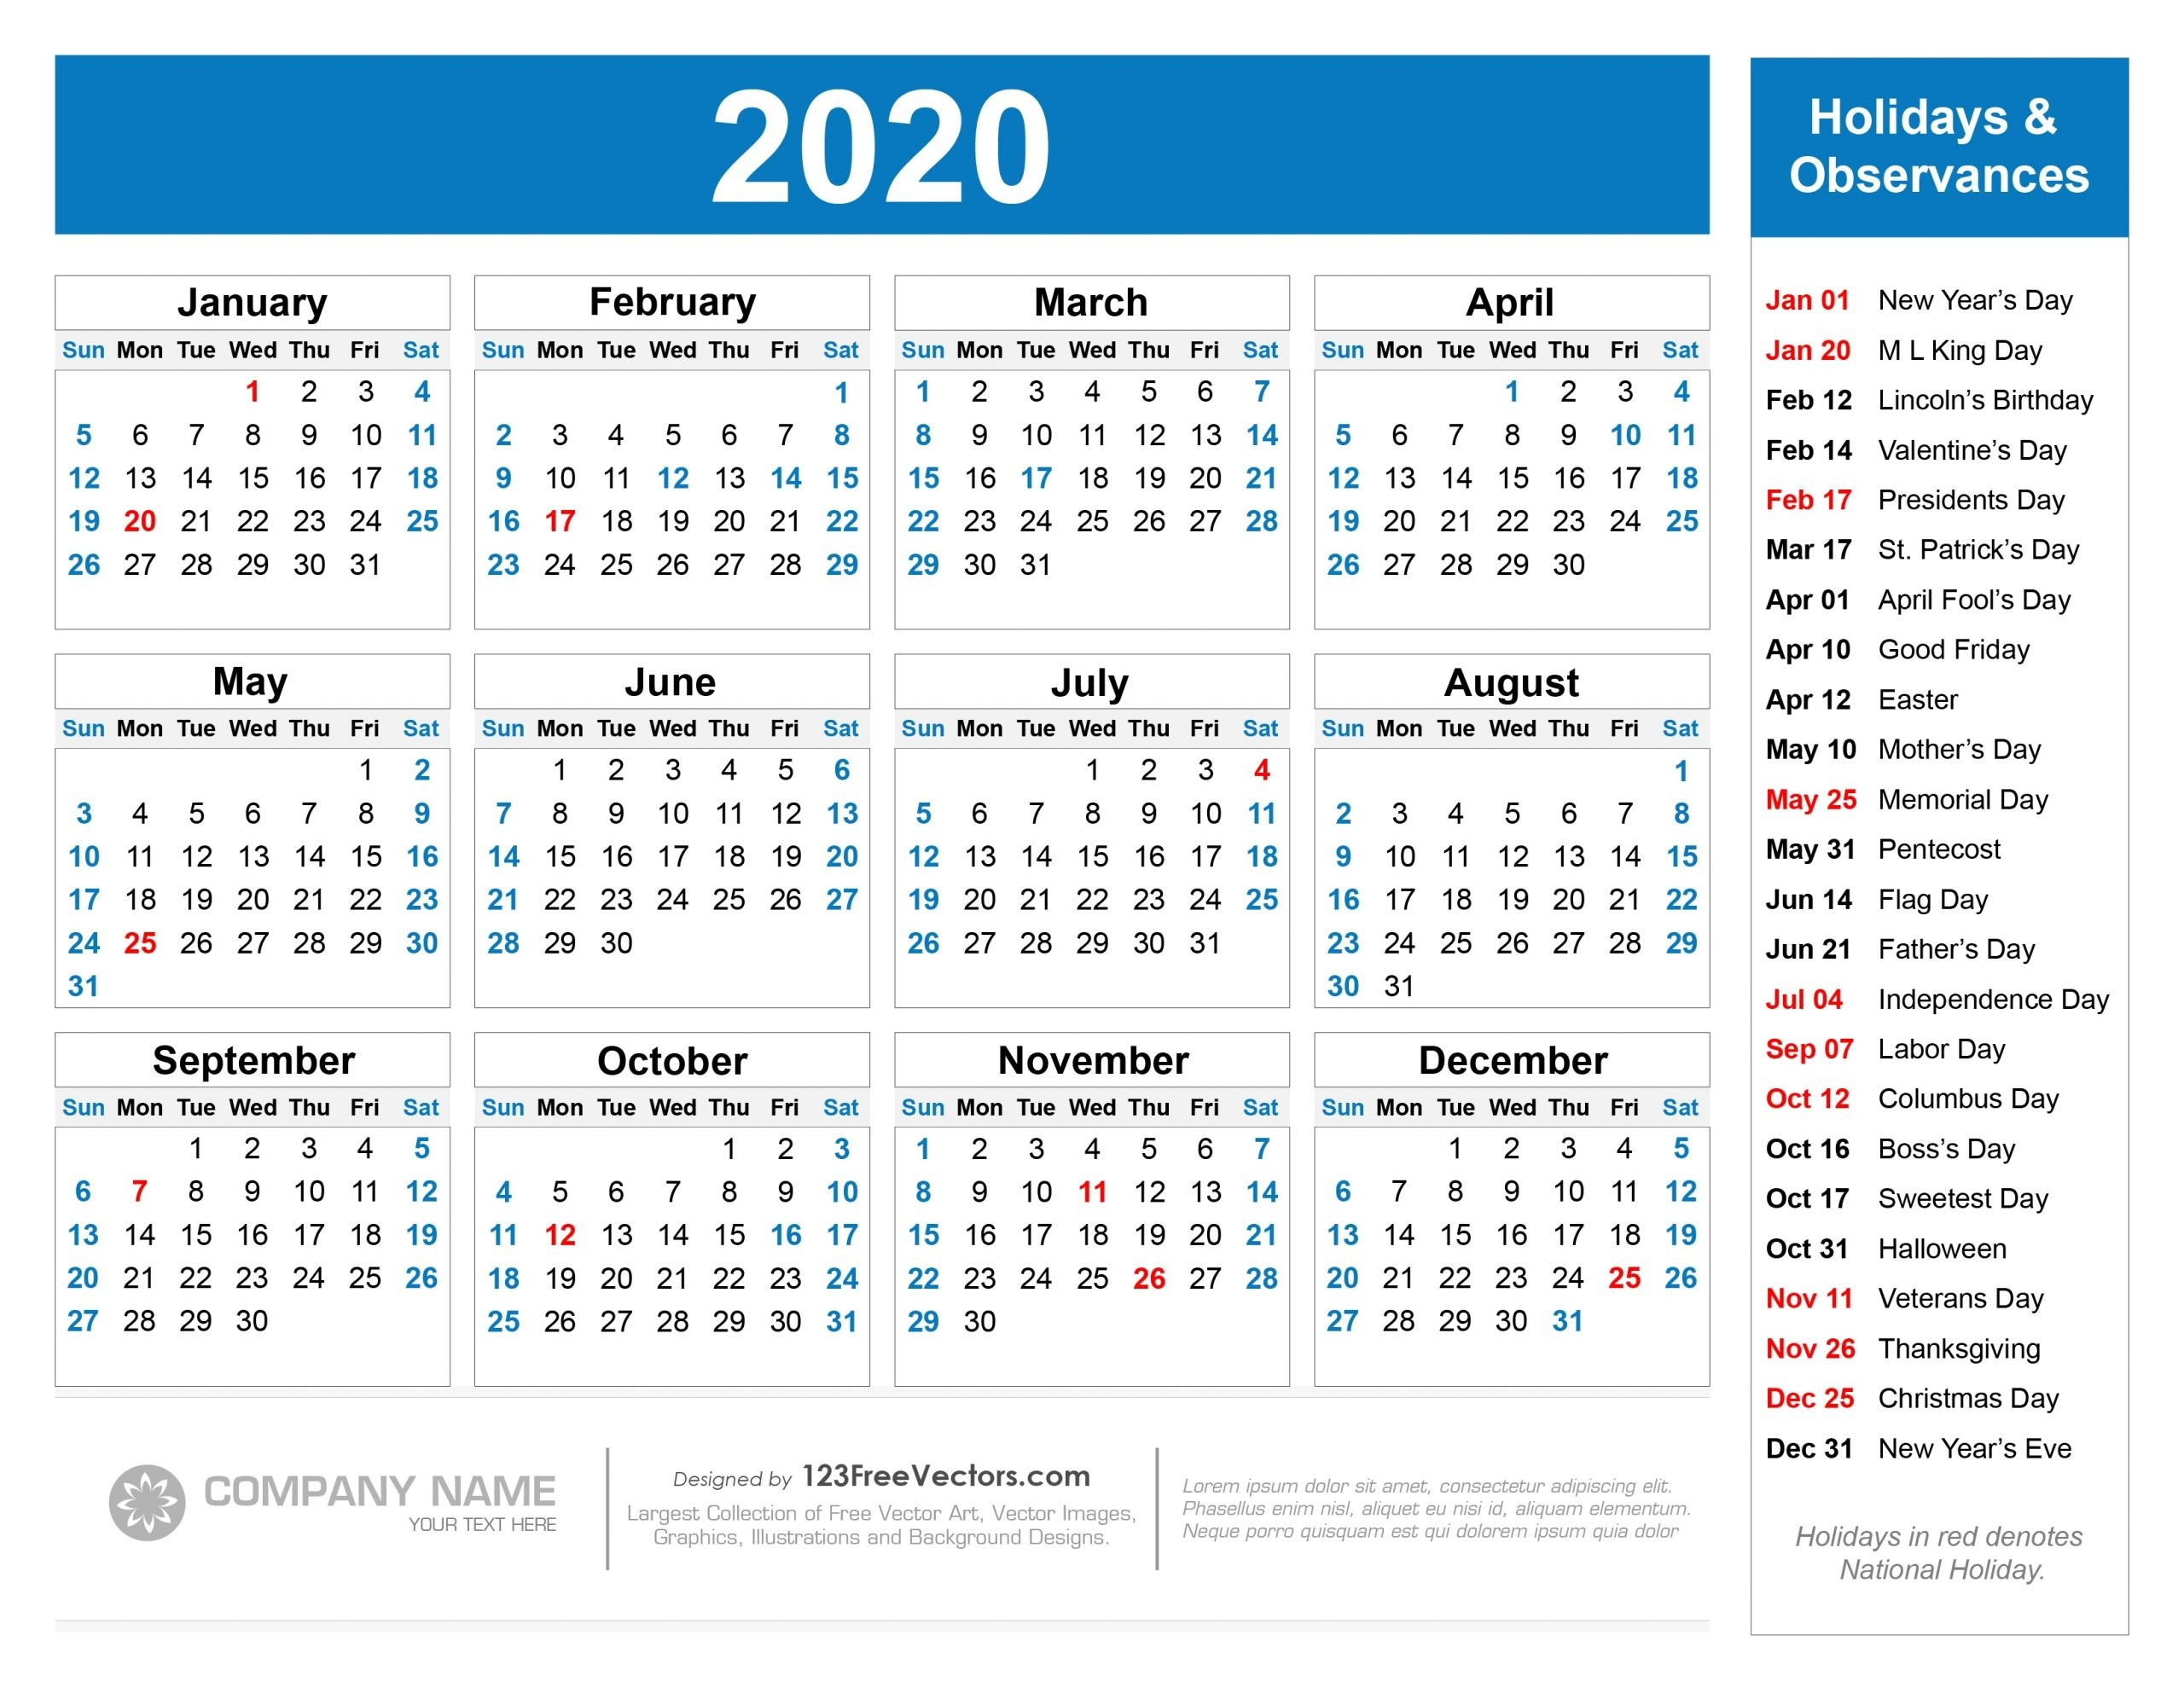 Collect 2020 Calendar With Federal Holidays | Calendar Printables Free Blank-Blank I 9 Form 2021